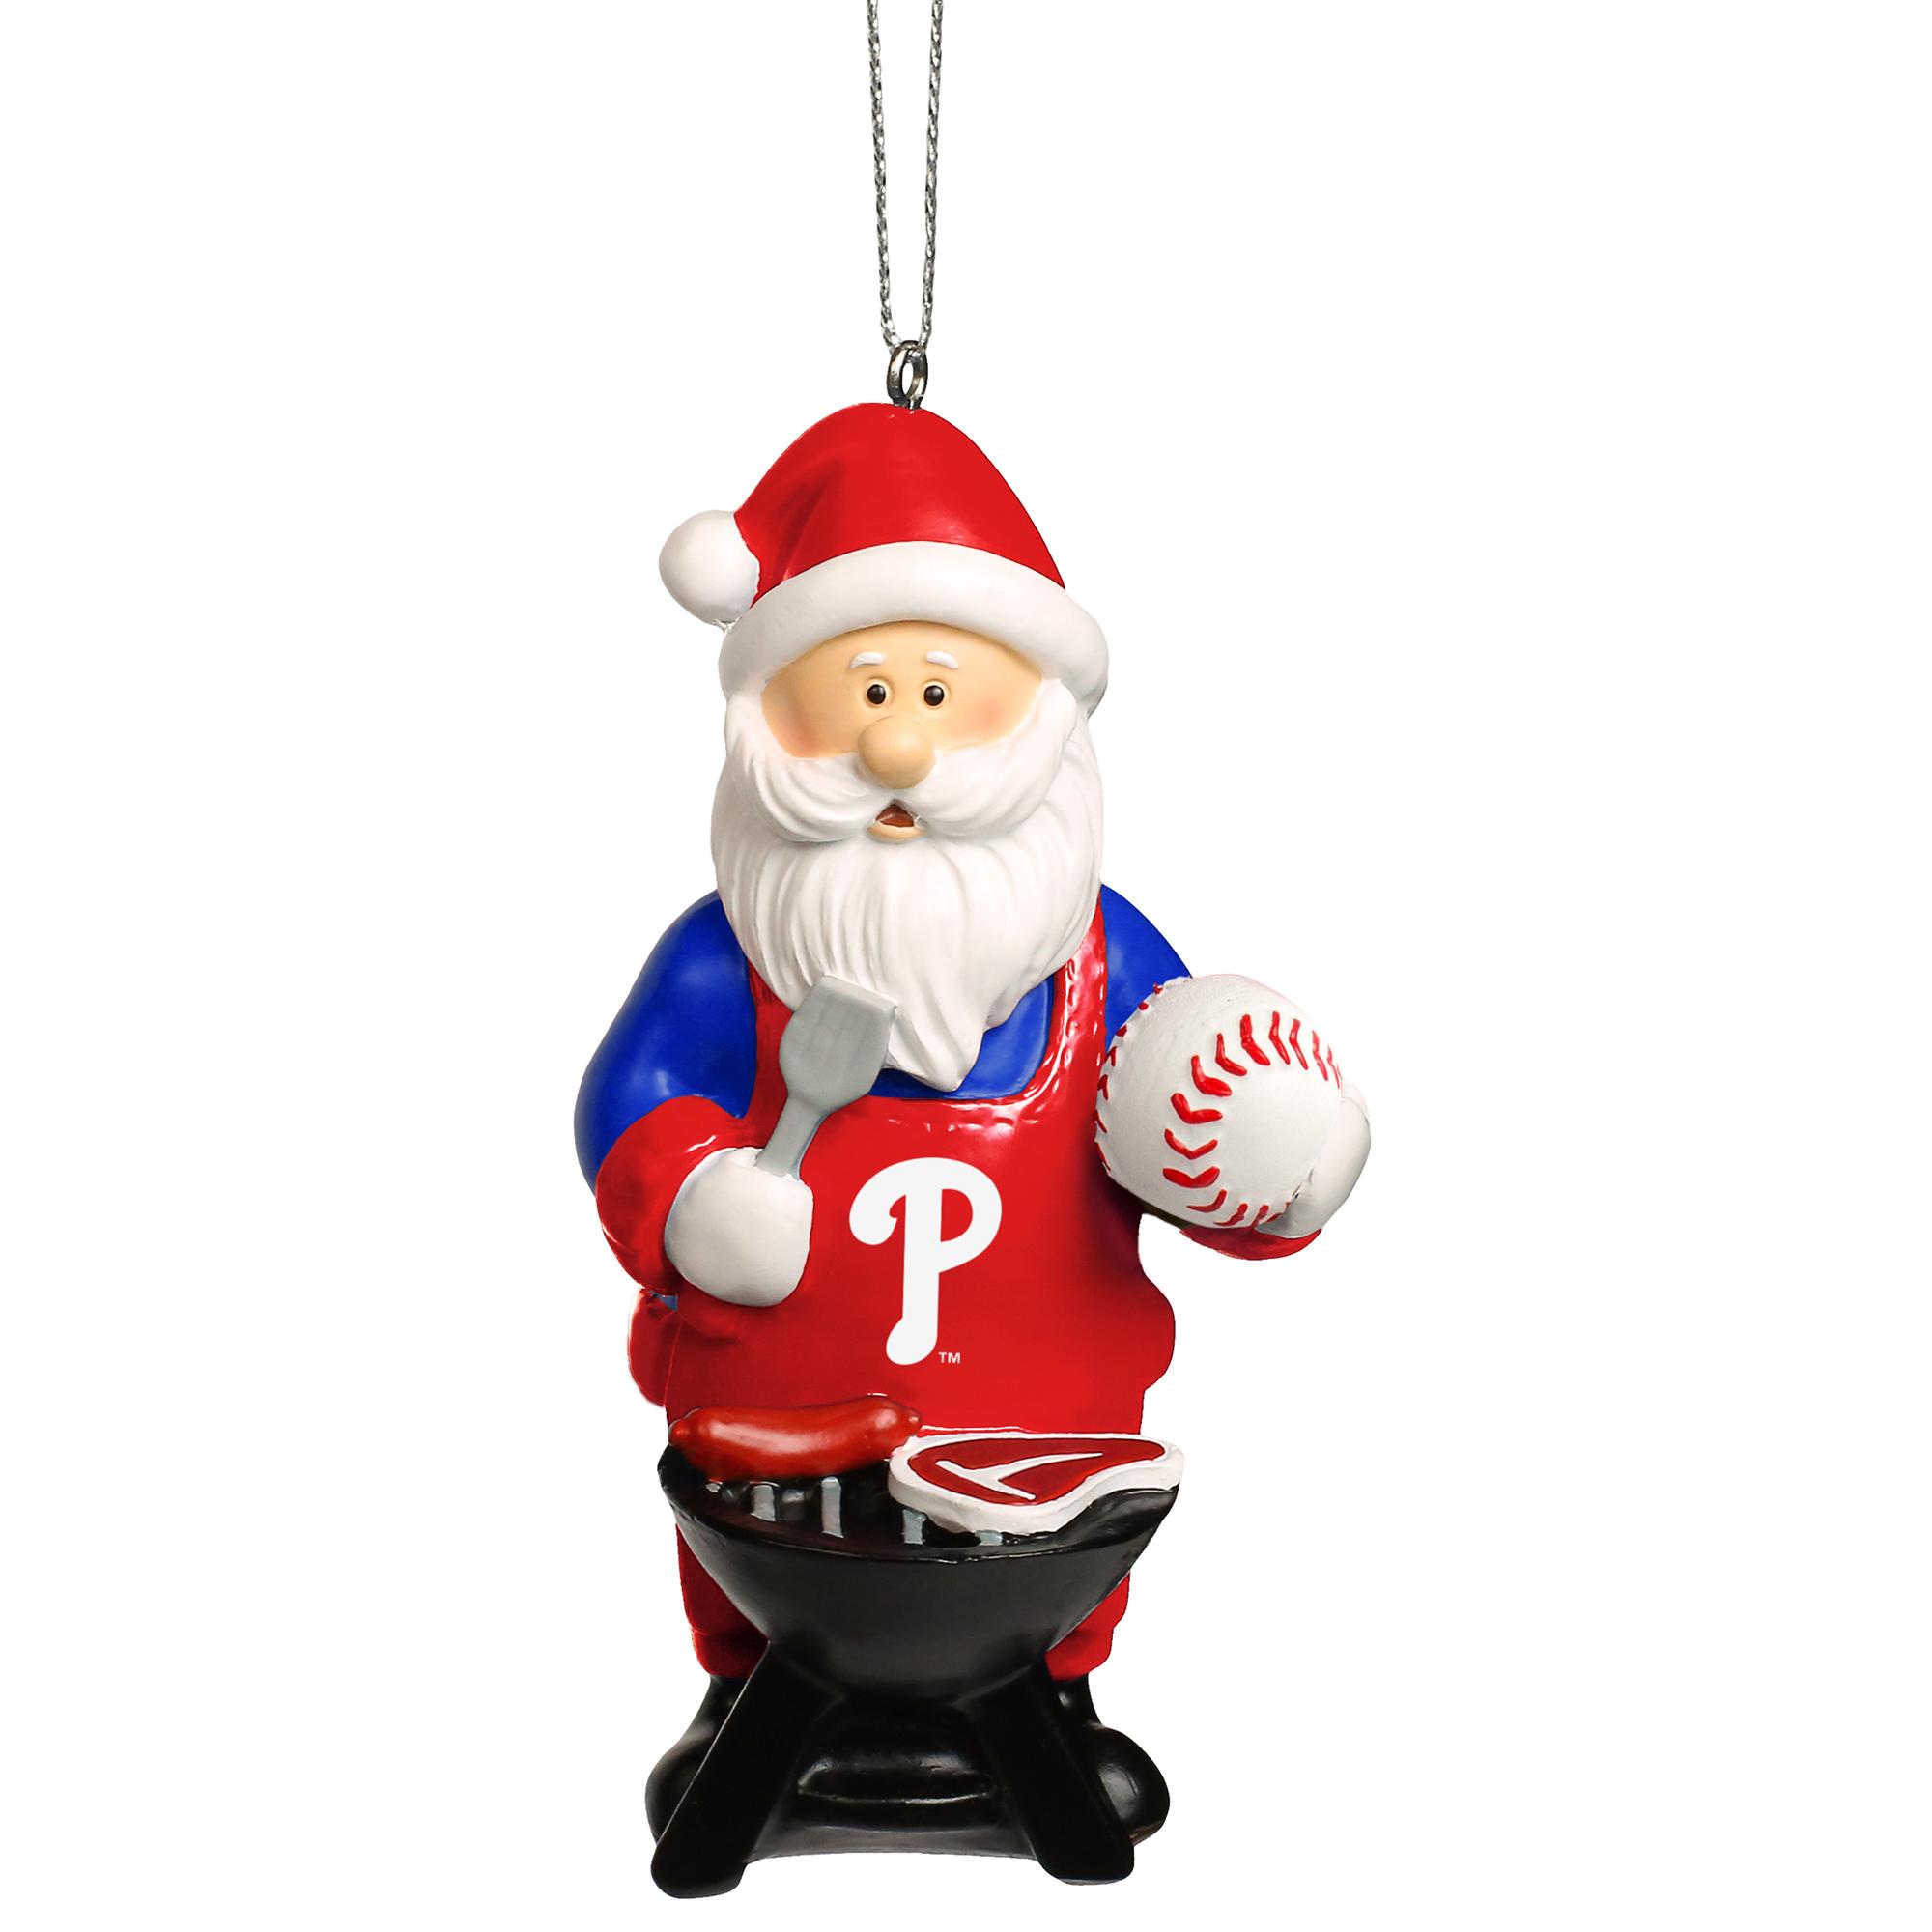 Philadelphia Phillies Santa Grill Ornament - No Size